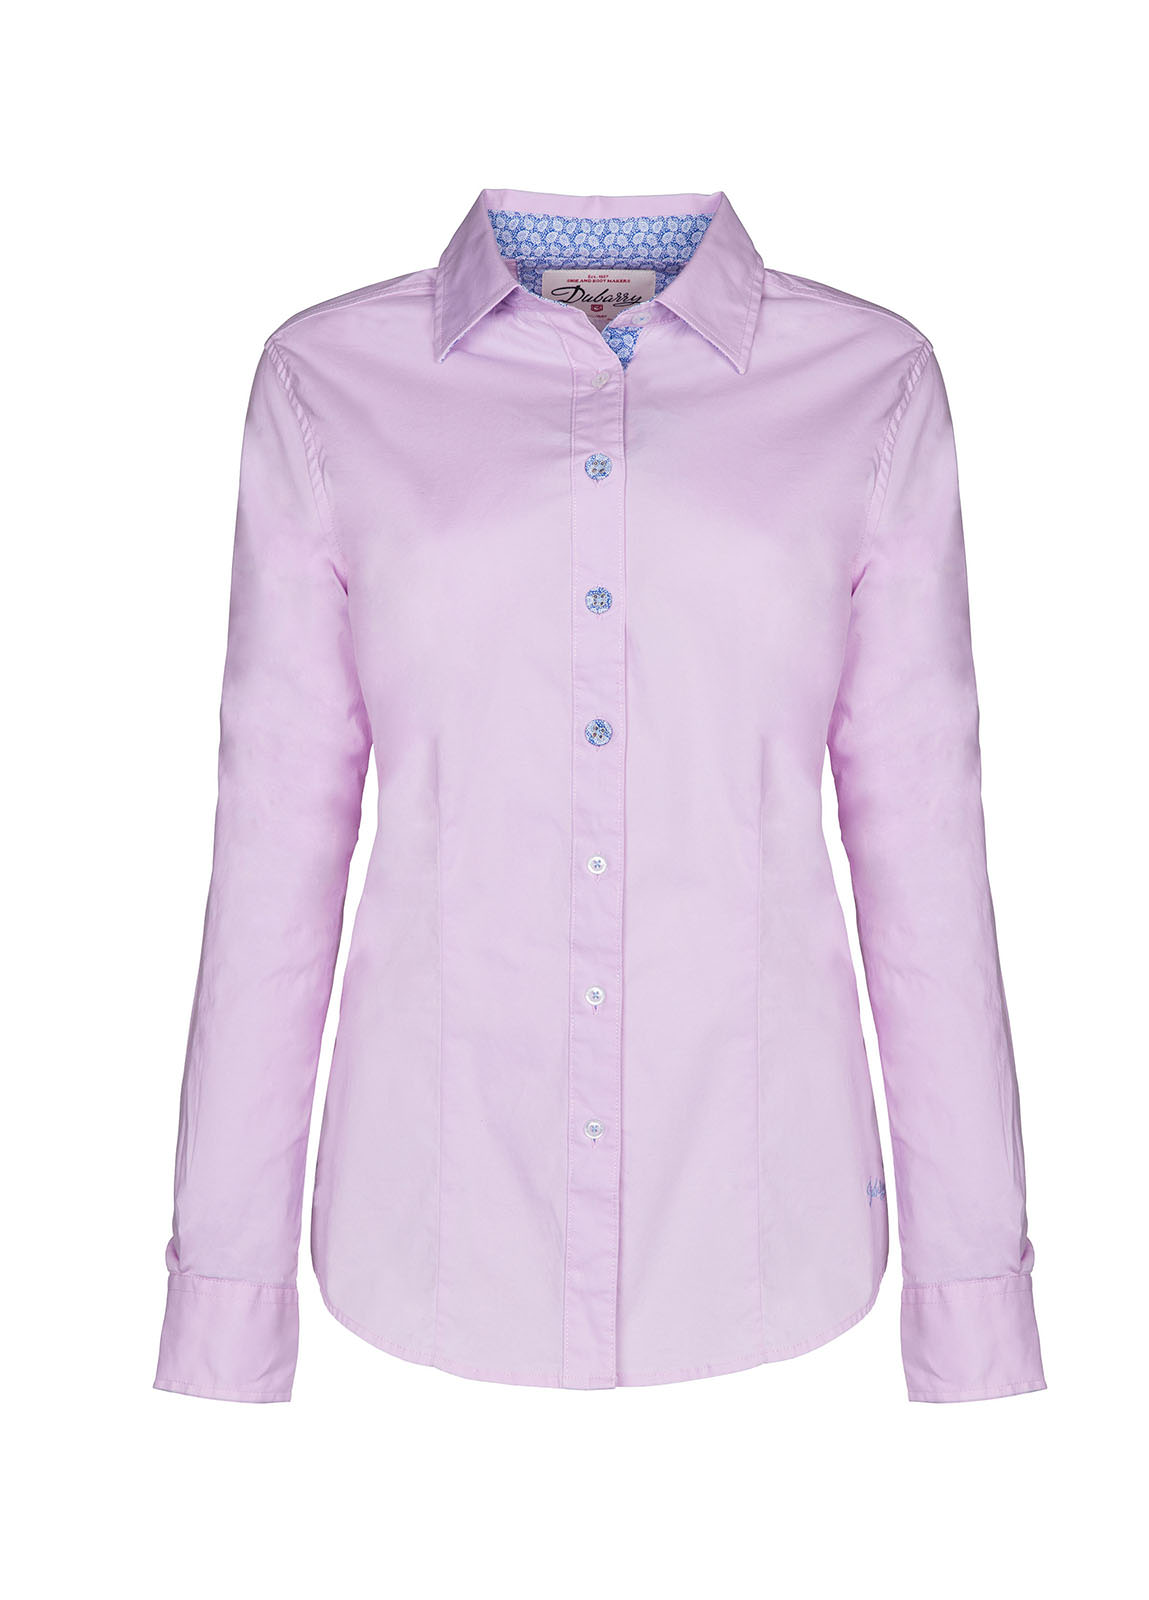 Dubarry_Clematis shirt - Pink_Image_2